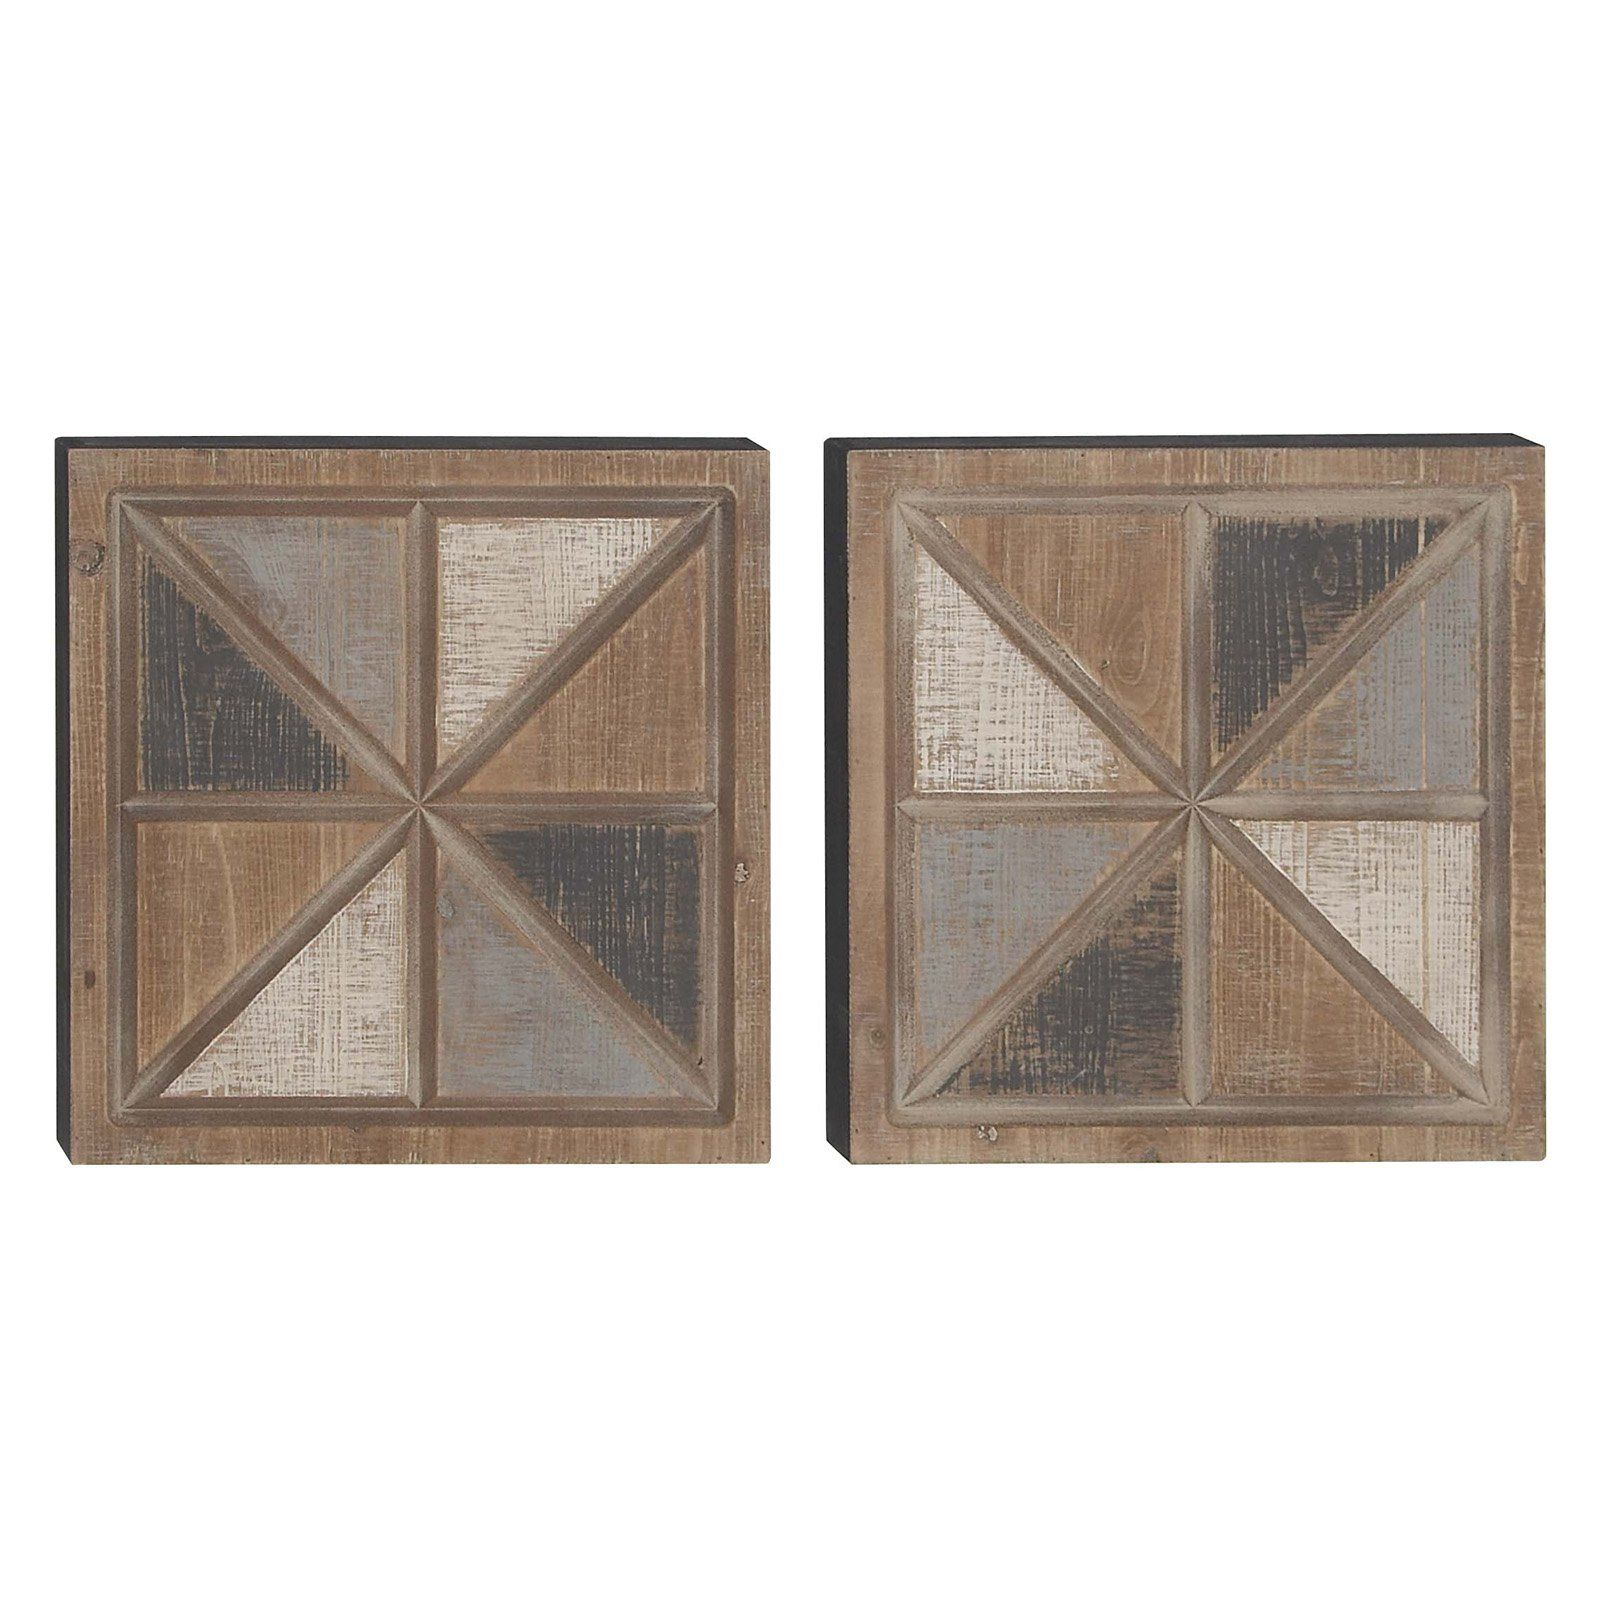 Decmode geometric square wood wall art set of 2 rustic